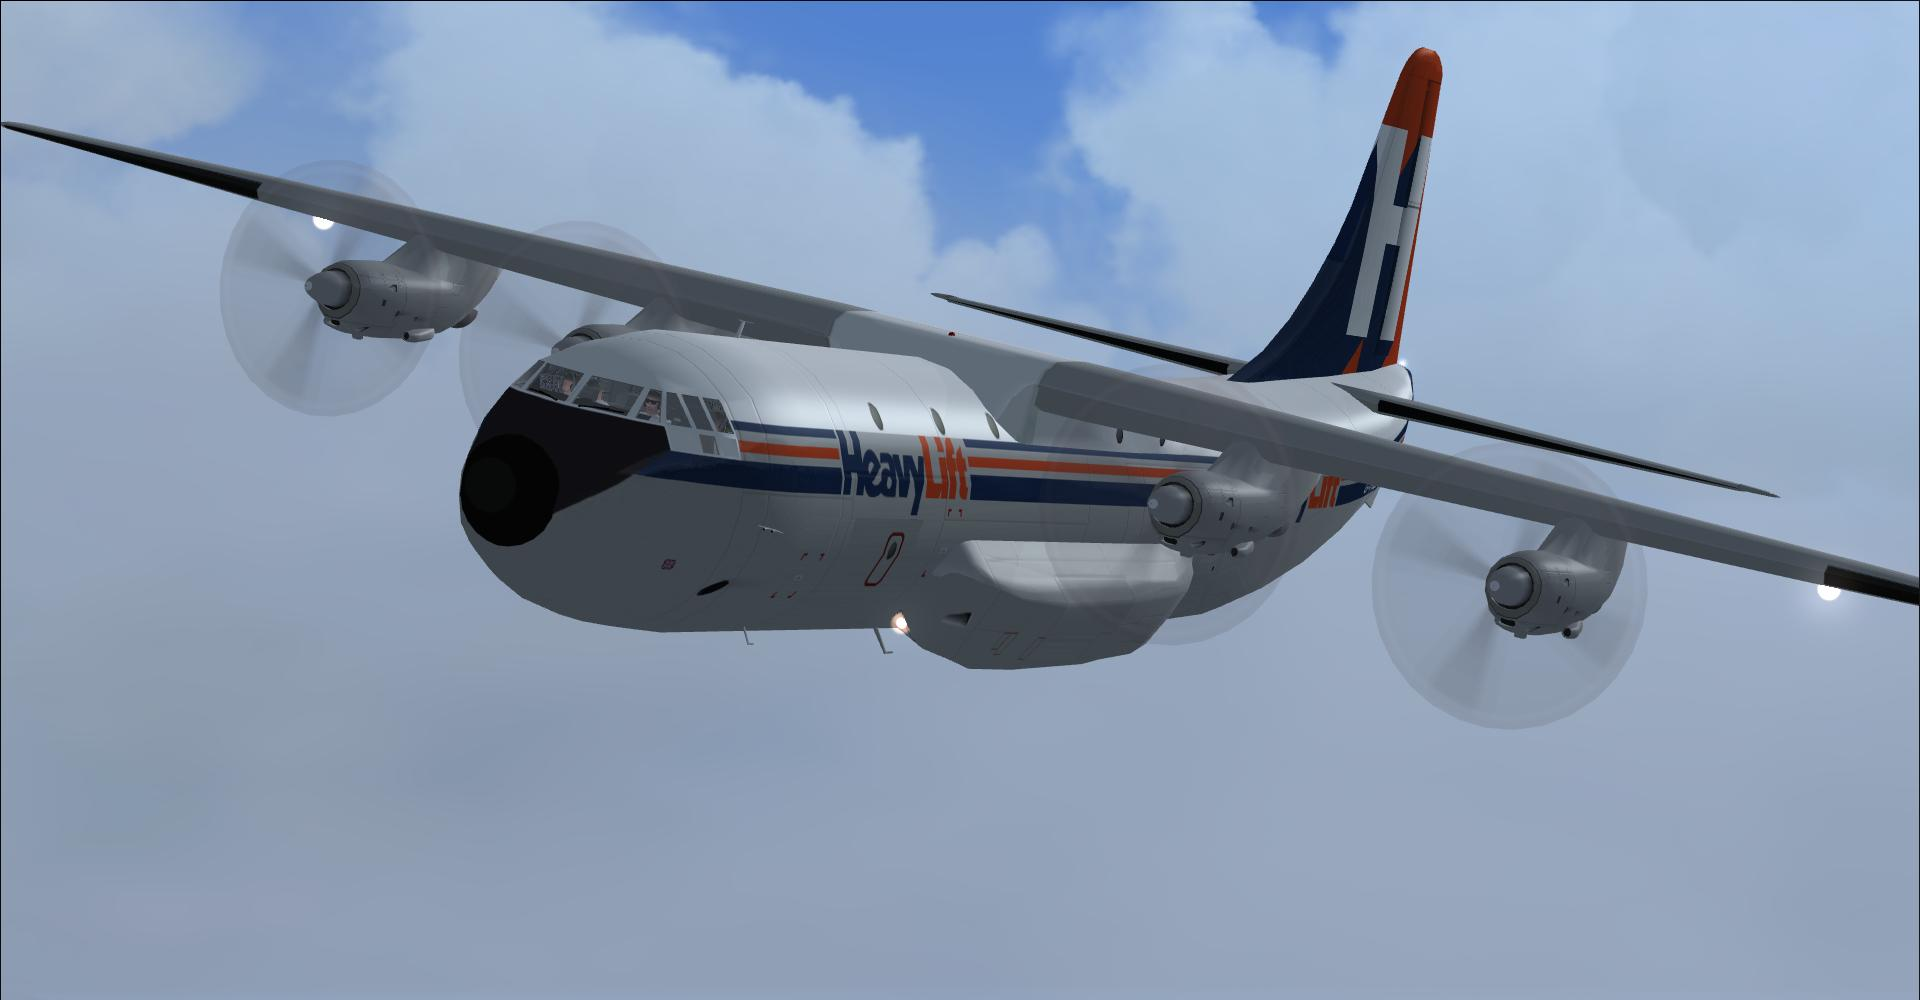 P3dv4 Addon Aircraft